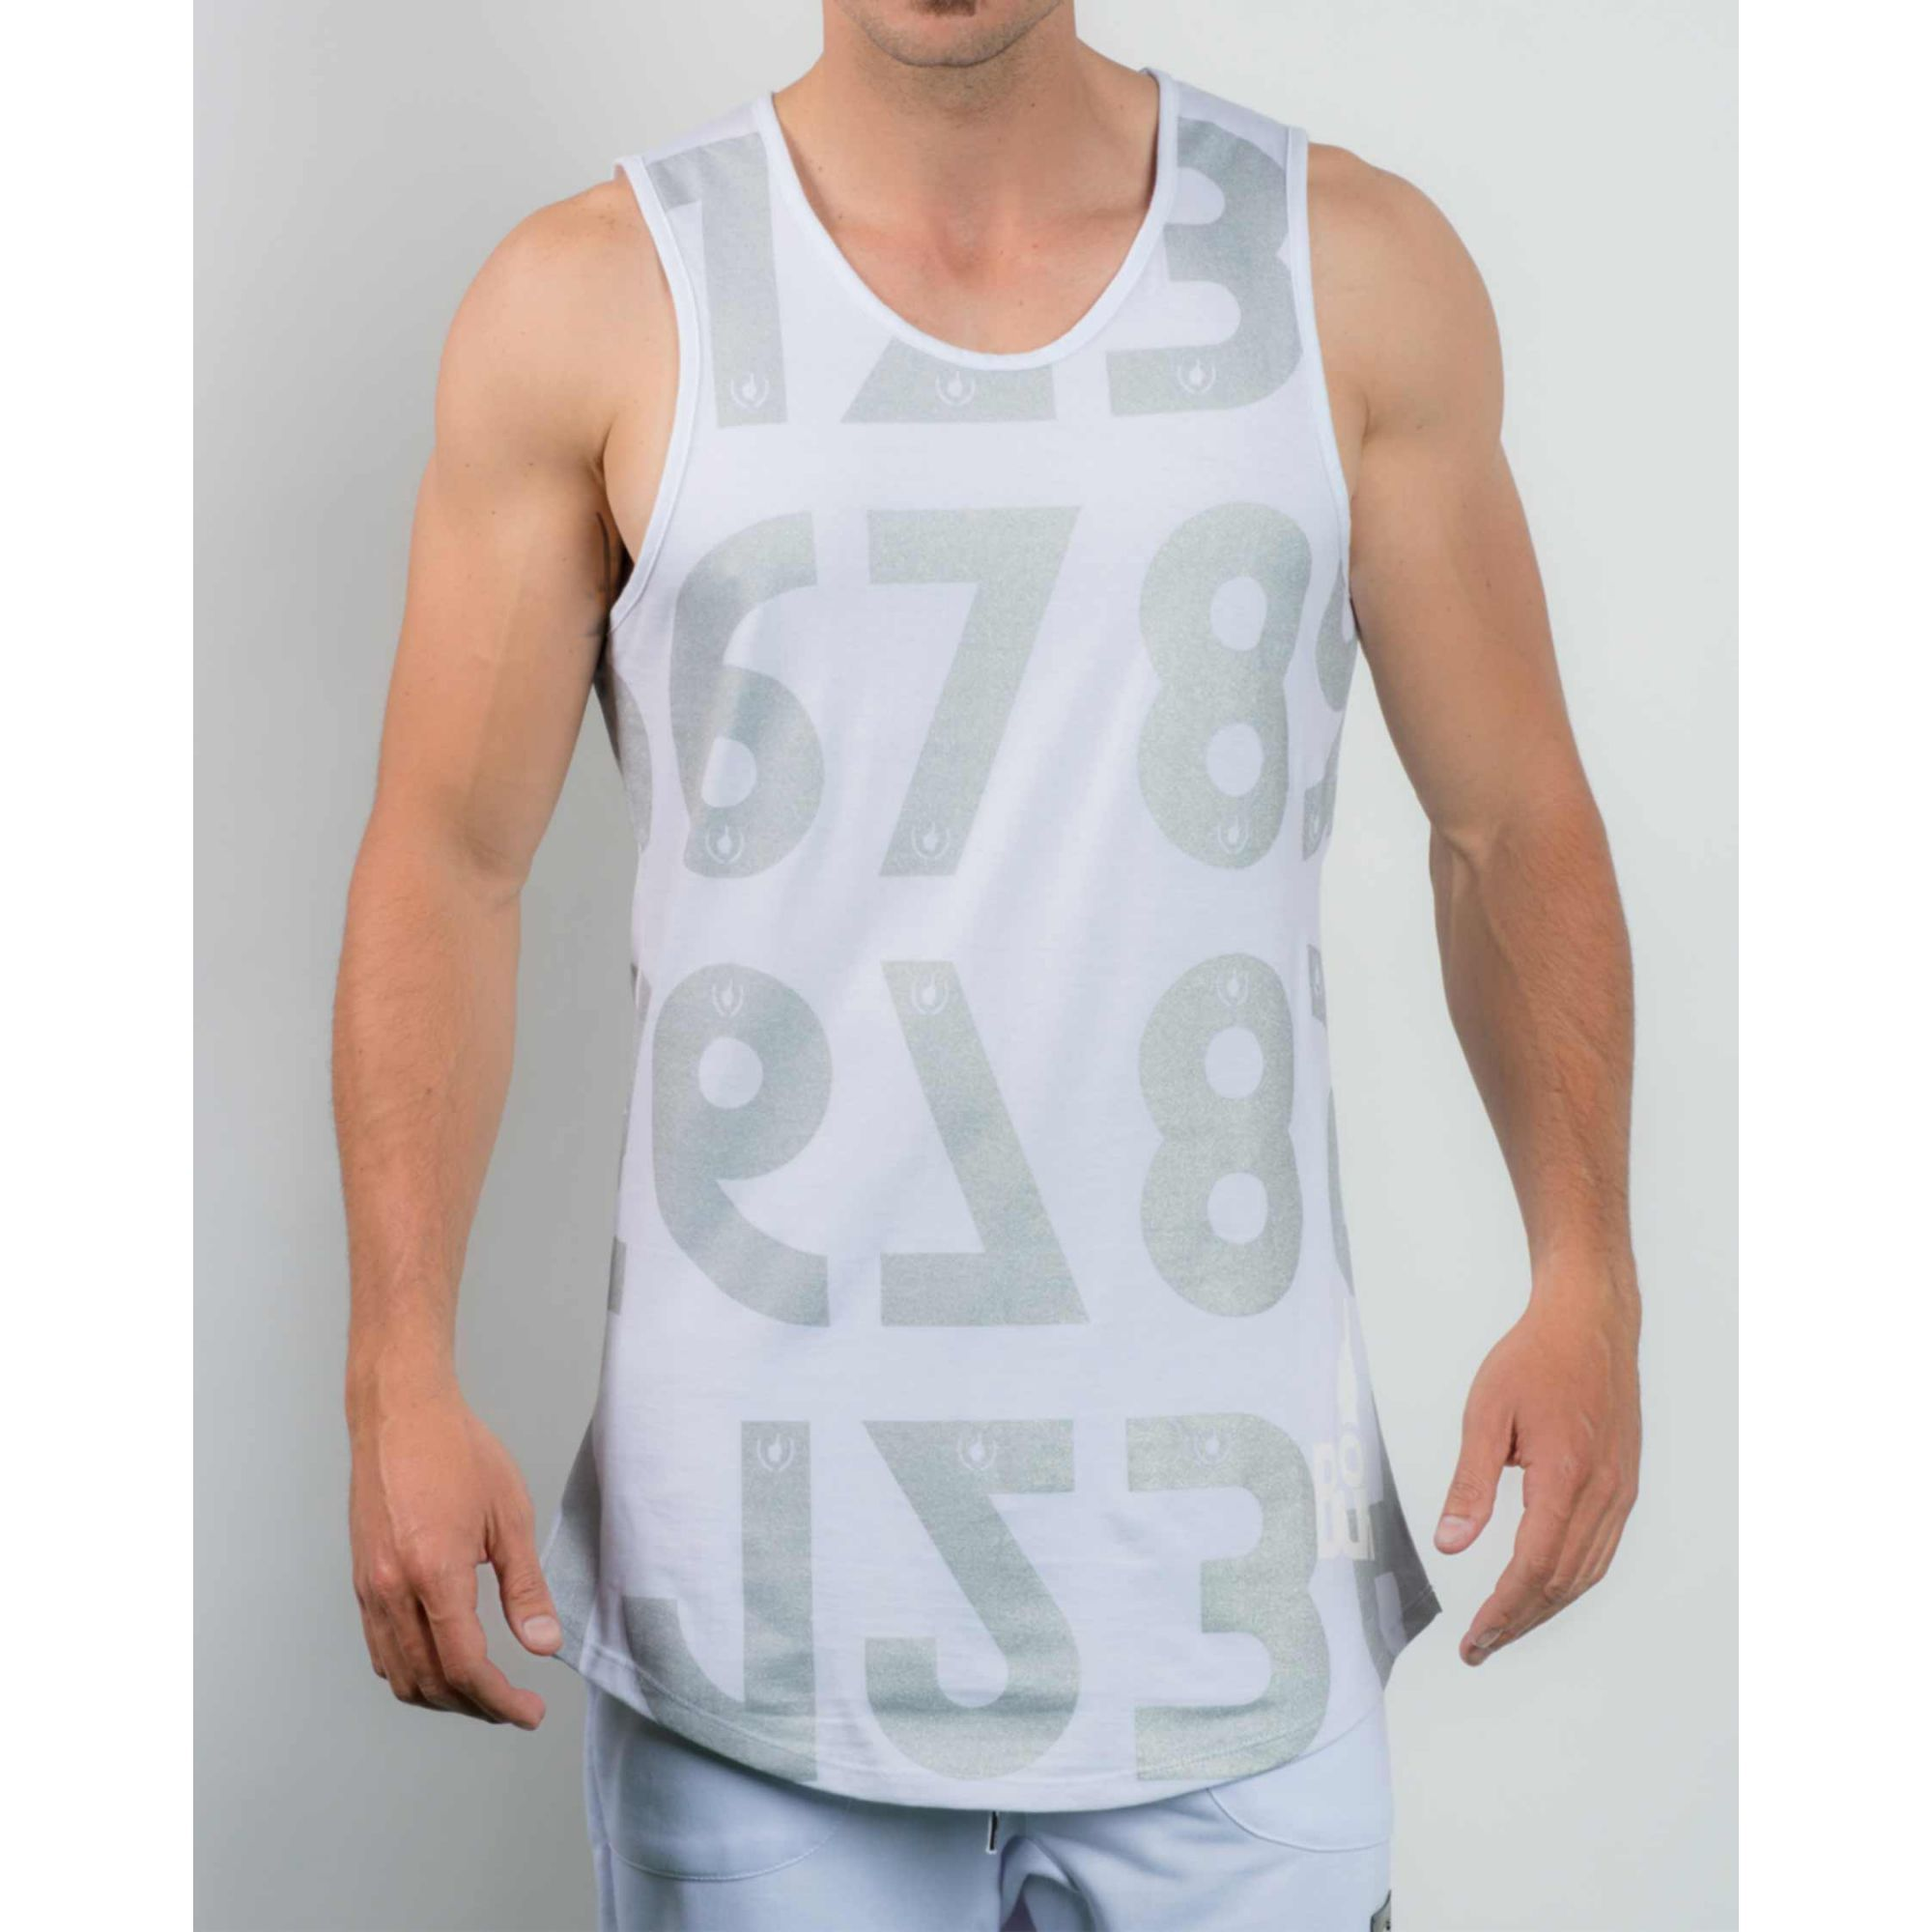 Regata Buh Numbers Ligth Grey